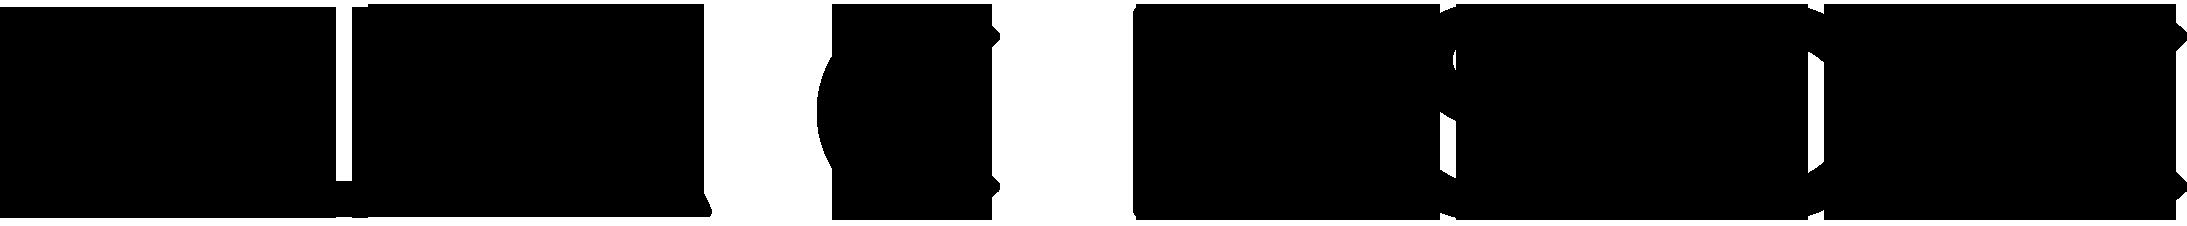 BLACKSOC